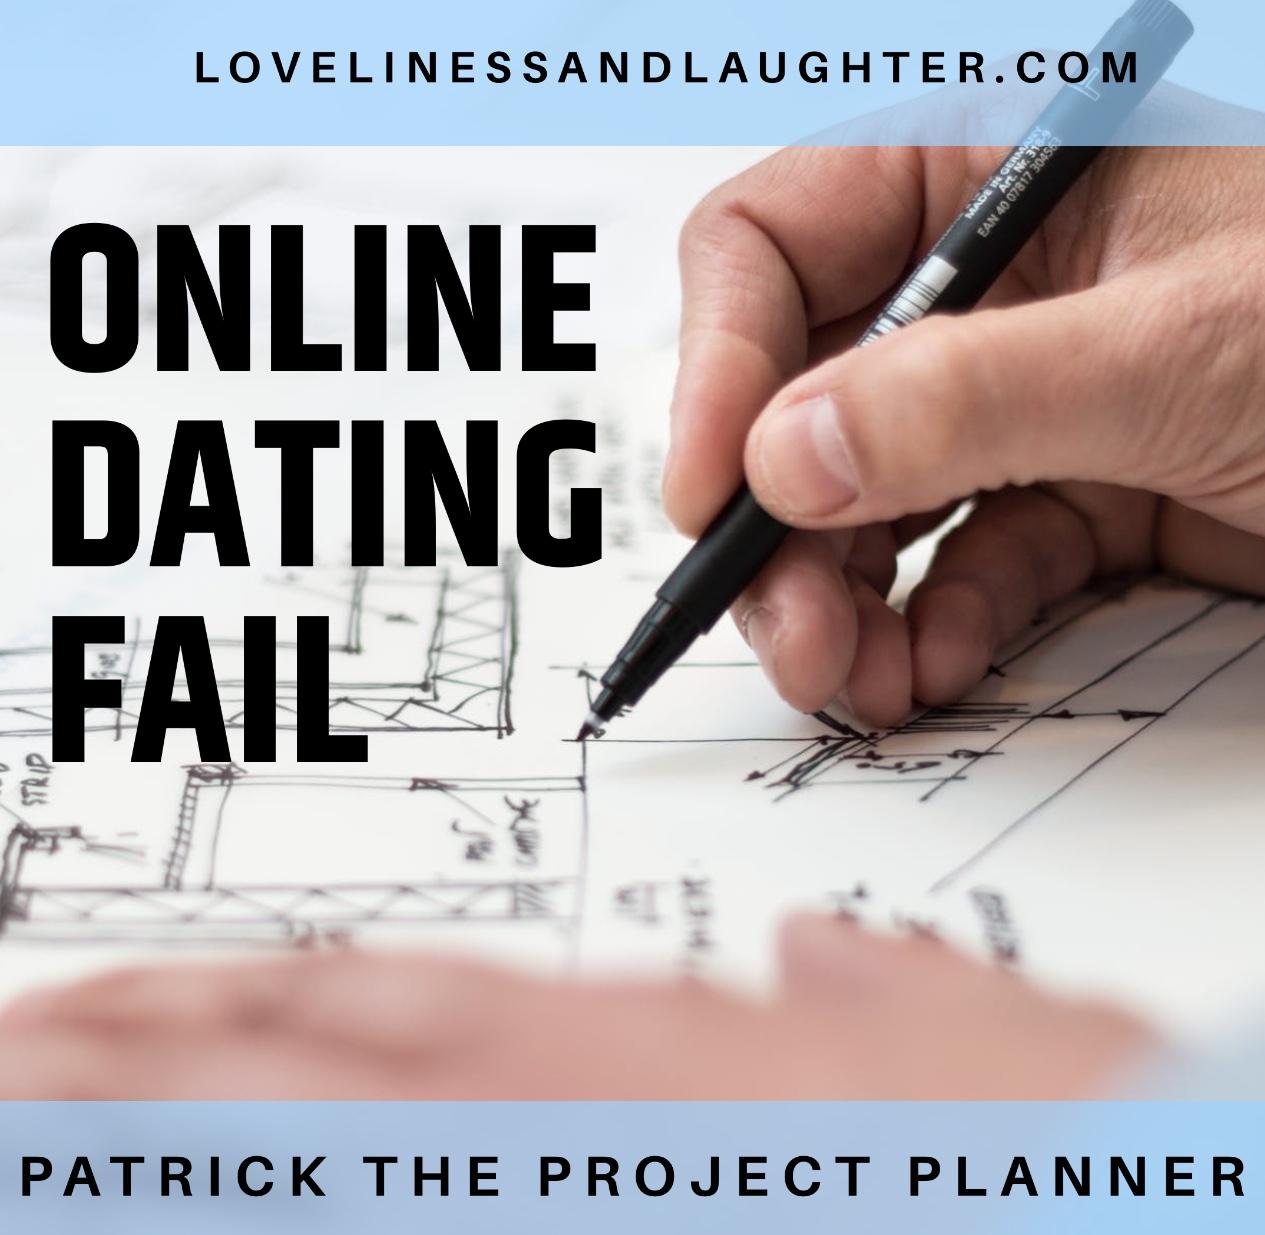 Handwriter online dating